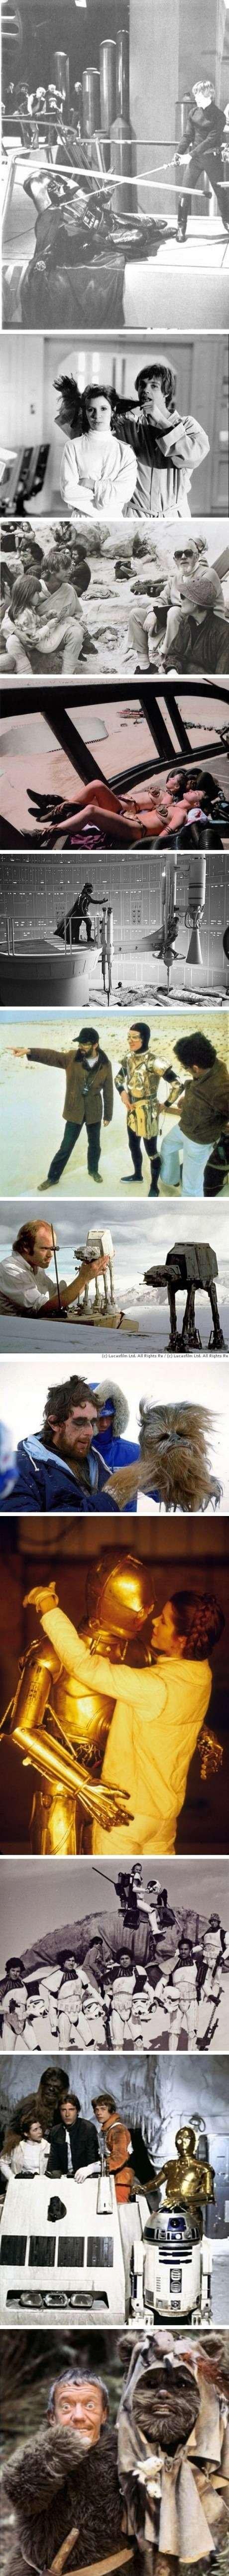 Star Wars Behind the Scene (see desc). .. heres another, liea handing luke a beer